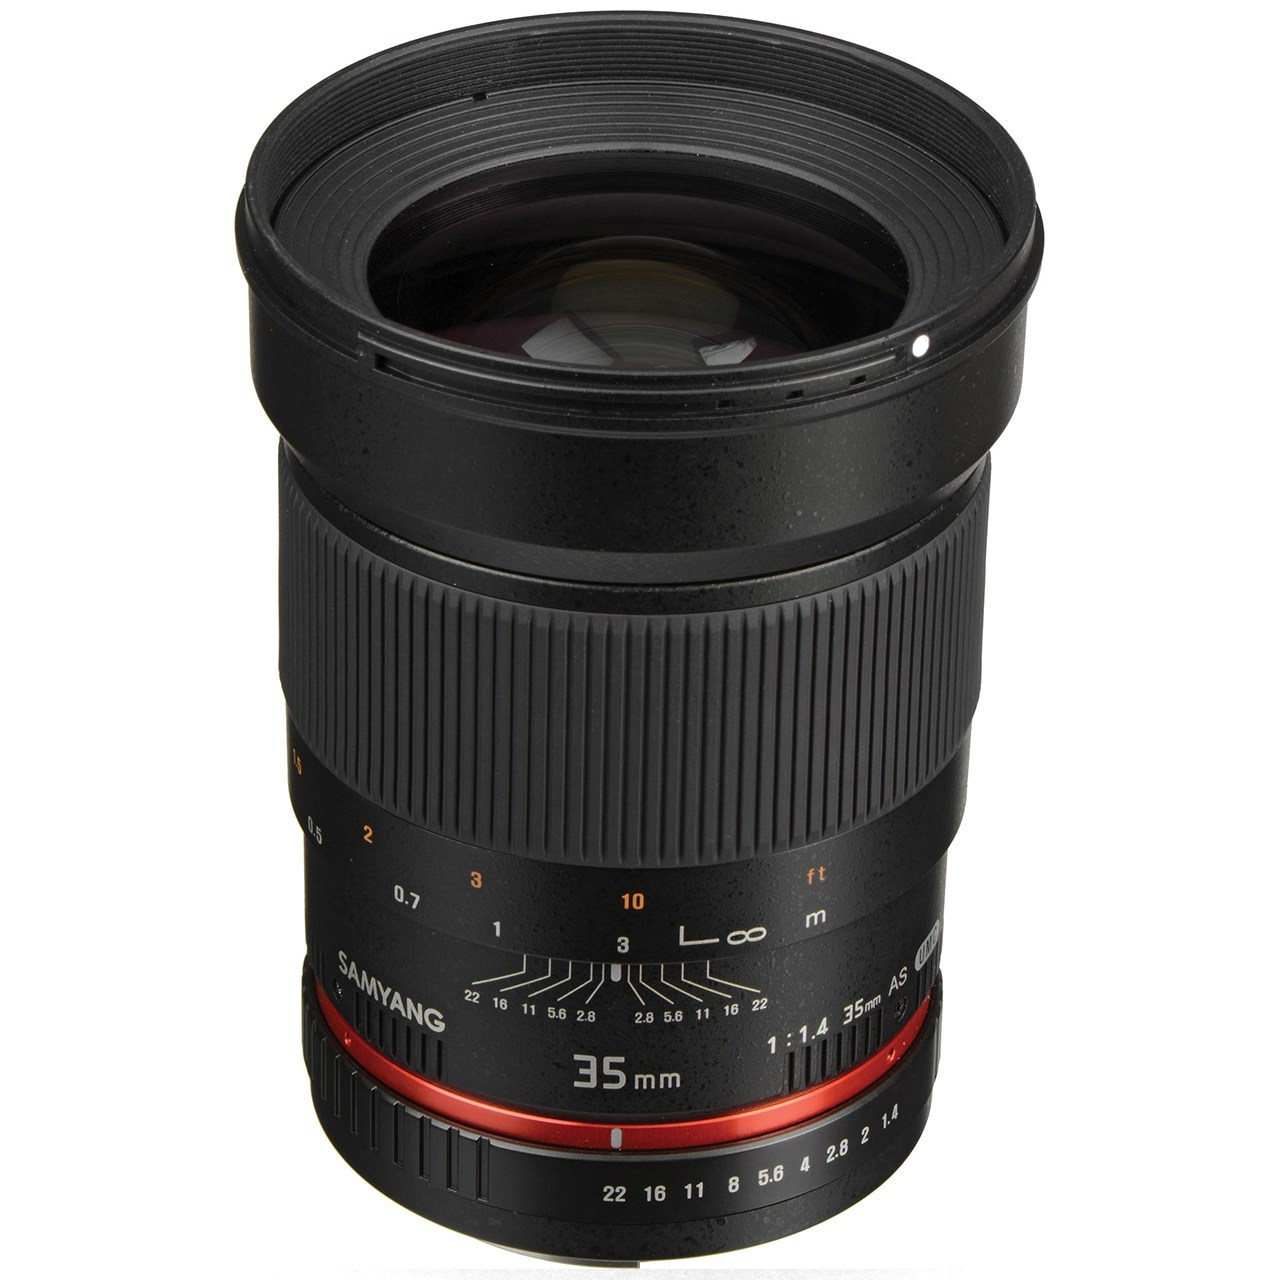 لنز سامیانگ 35mm f/1.4 AS IF UMC Nikon